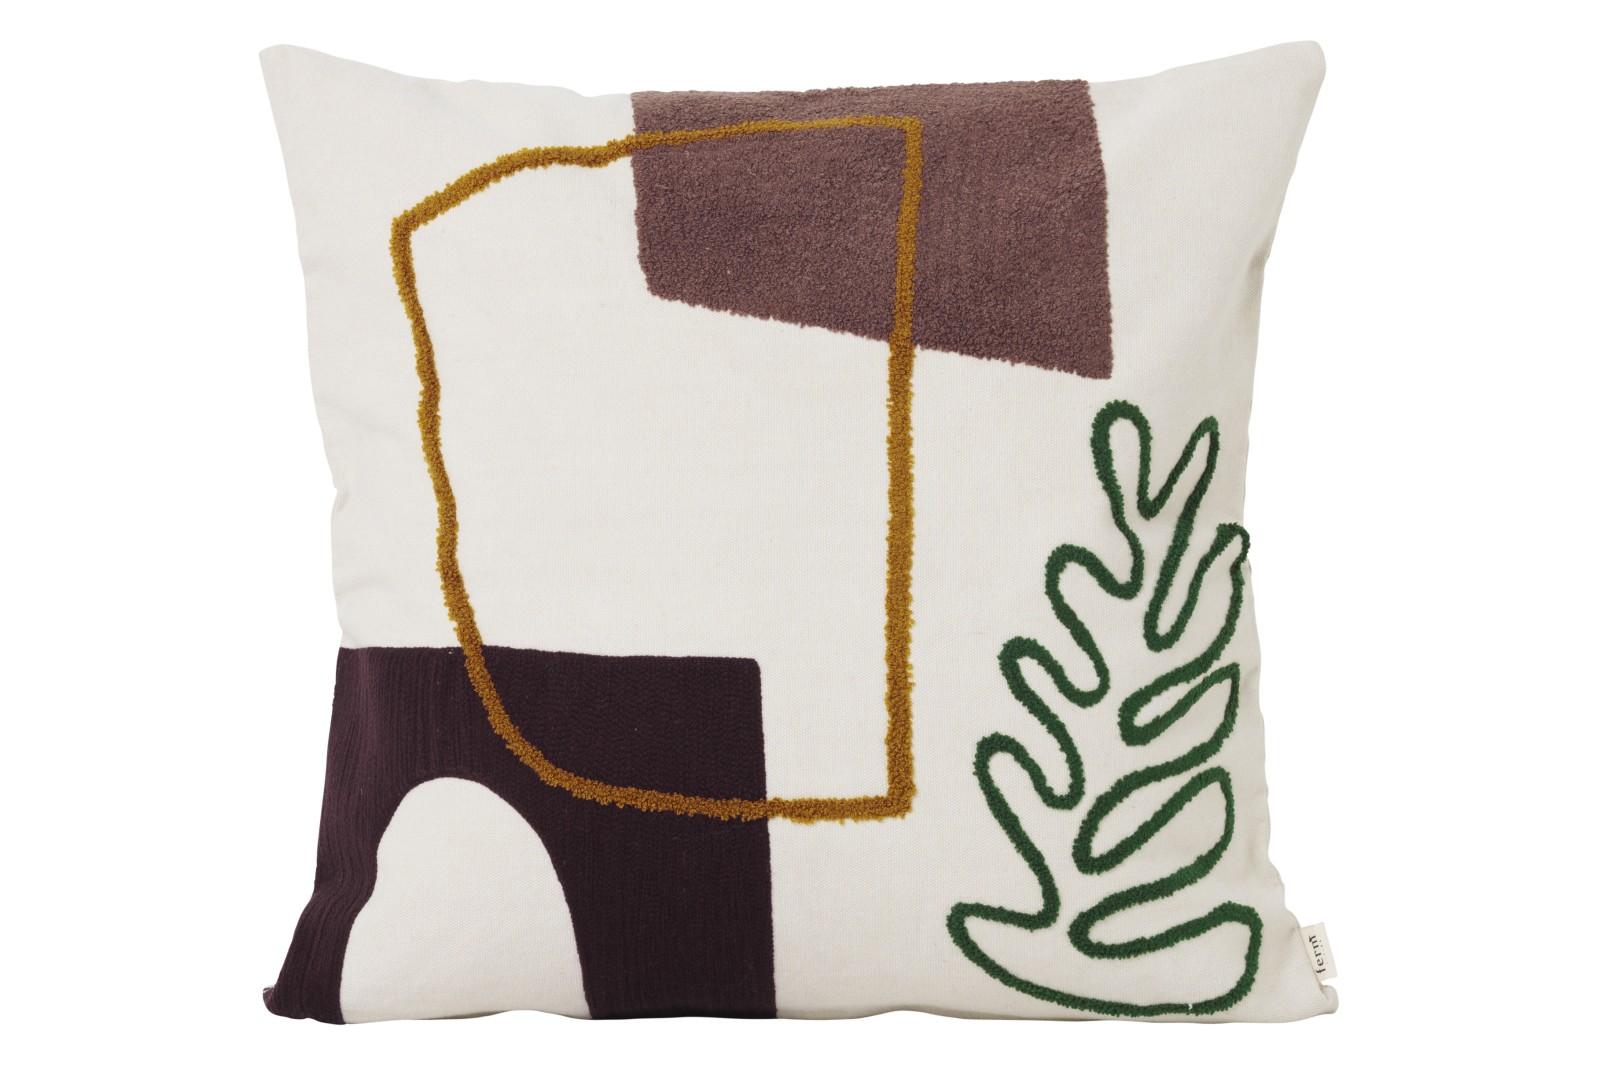 Mirage Cushion - Set of 2 Leaf